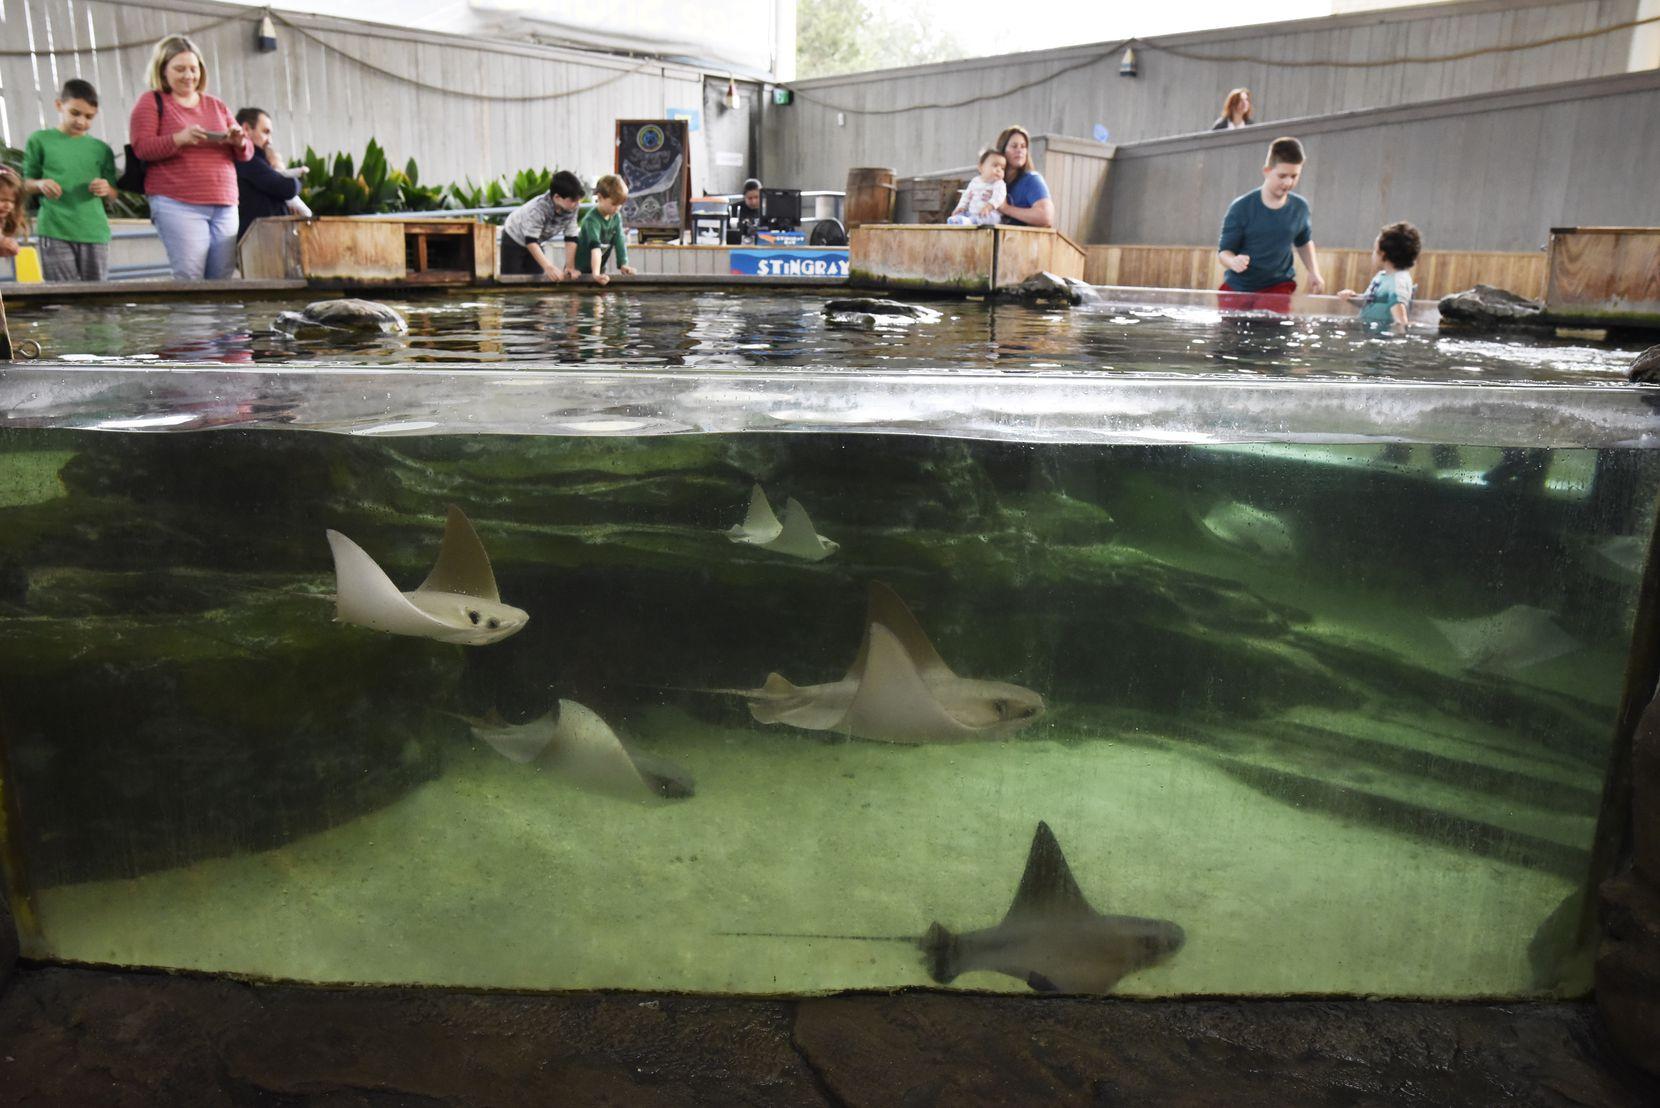 The Dallas Zoo plans to permanently close the Children's Aquarium at Fair Park.